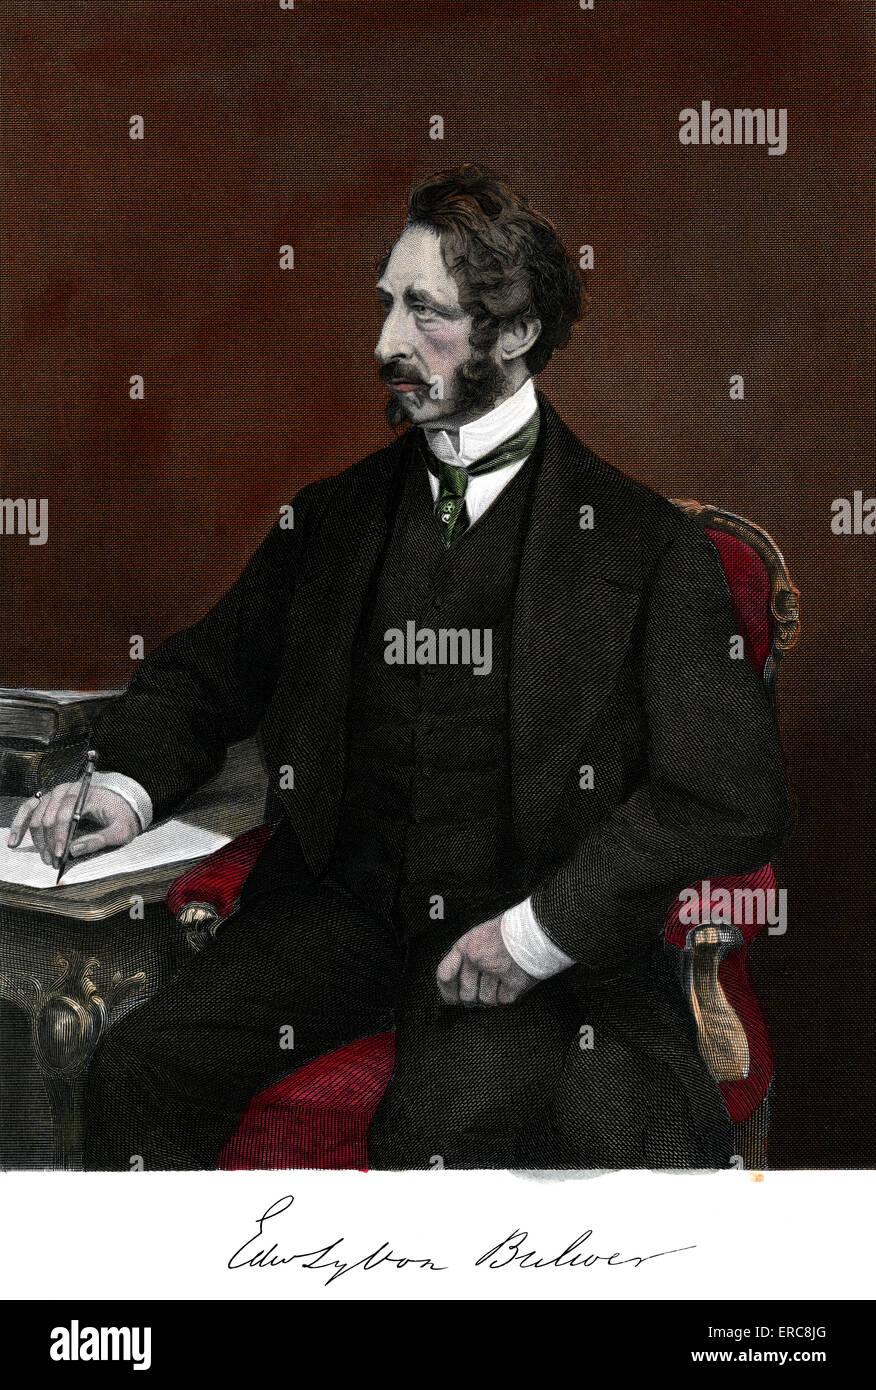 1800s 1860 PORTRAIT EDWARD BULWER LYTTON ENGLISH NOVELIST POLITICIAN PLAYWRIGHT Stock Photo